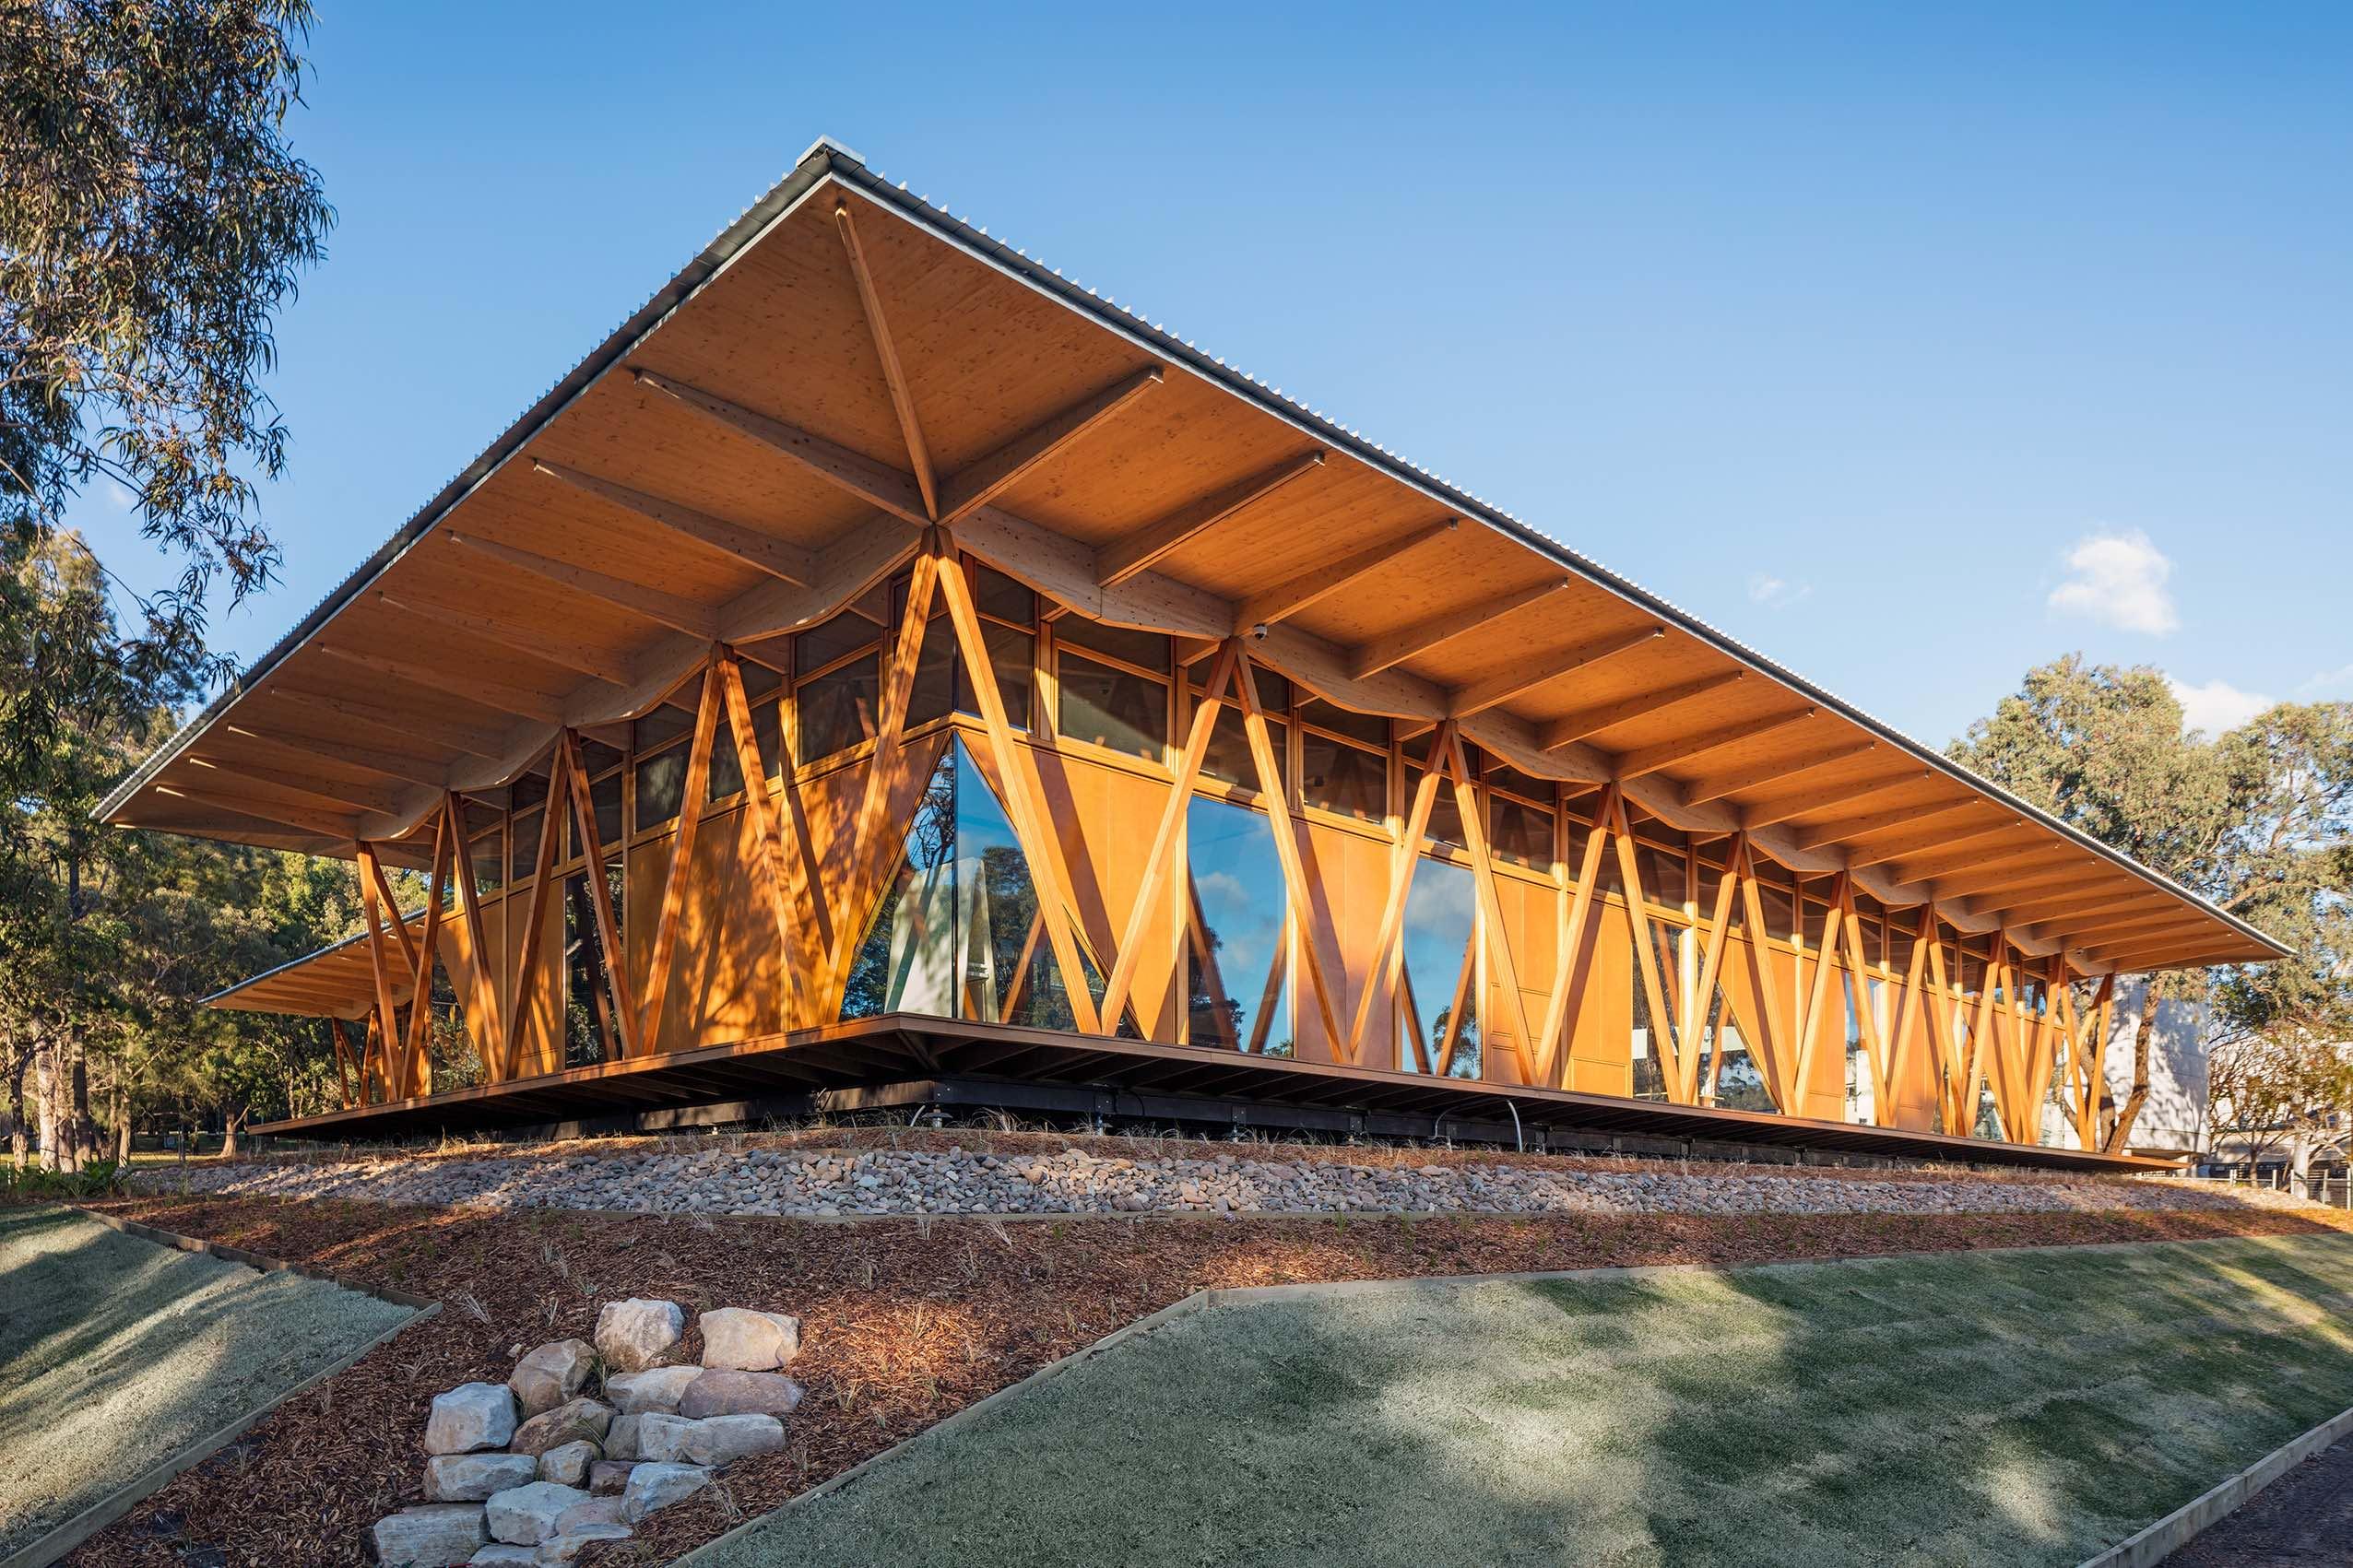 2017 Atda Winner Macquarie University Innovation Hub